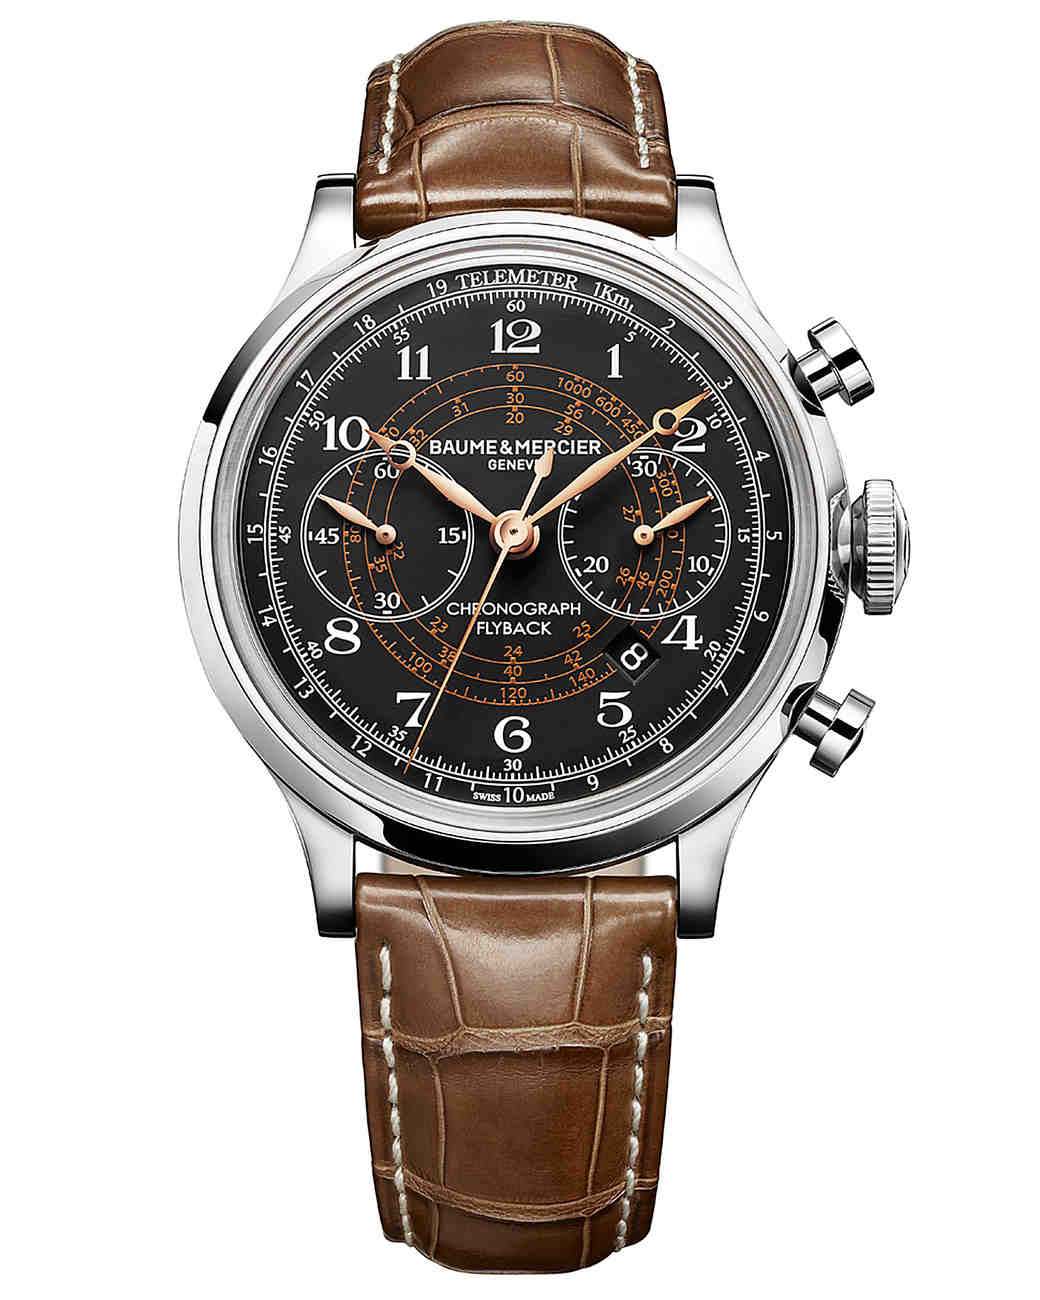 baume-mercier-watch-capeland-10068-0514.jpg